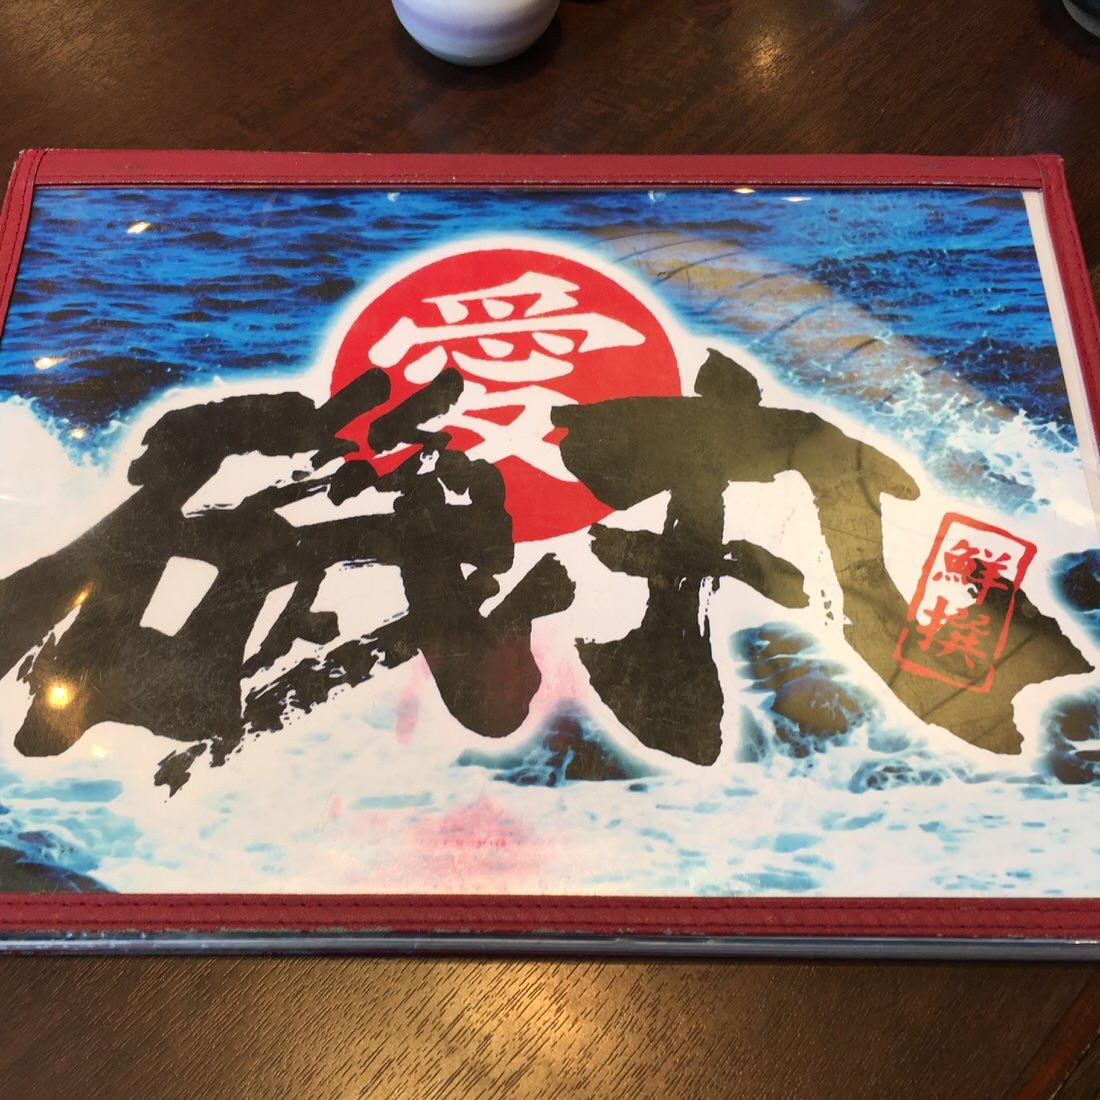 【GW】静岡県沼津港の寿司店『磯丸』は廻らない寿司をリーズナブルに楽しめる!